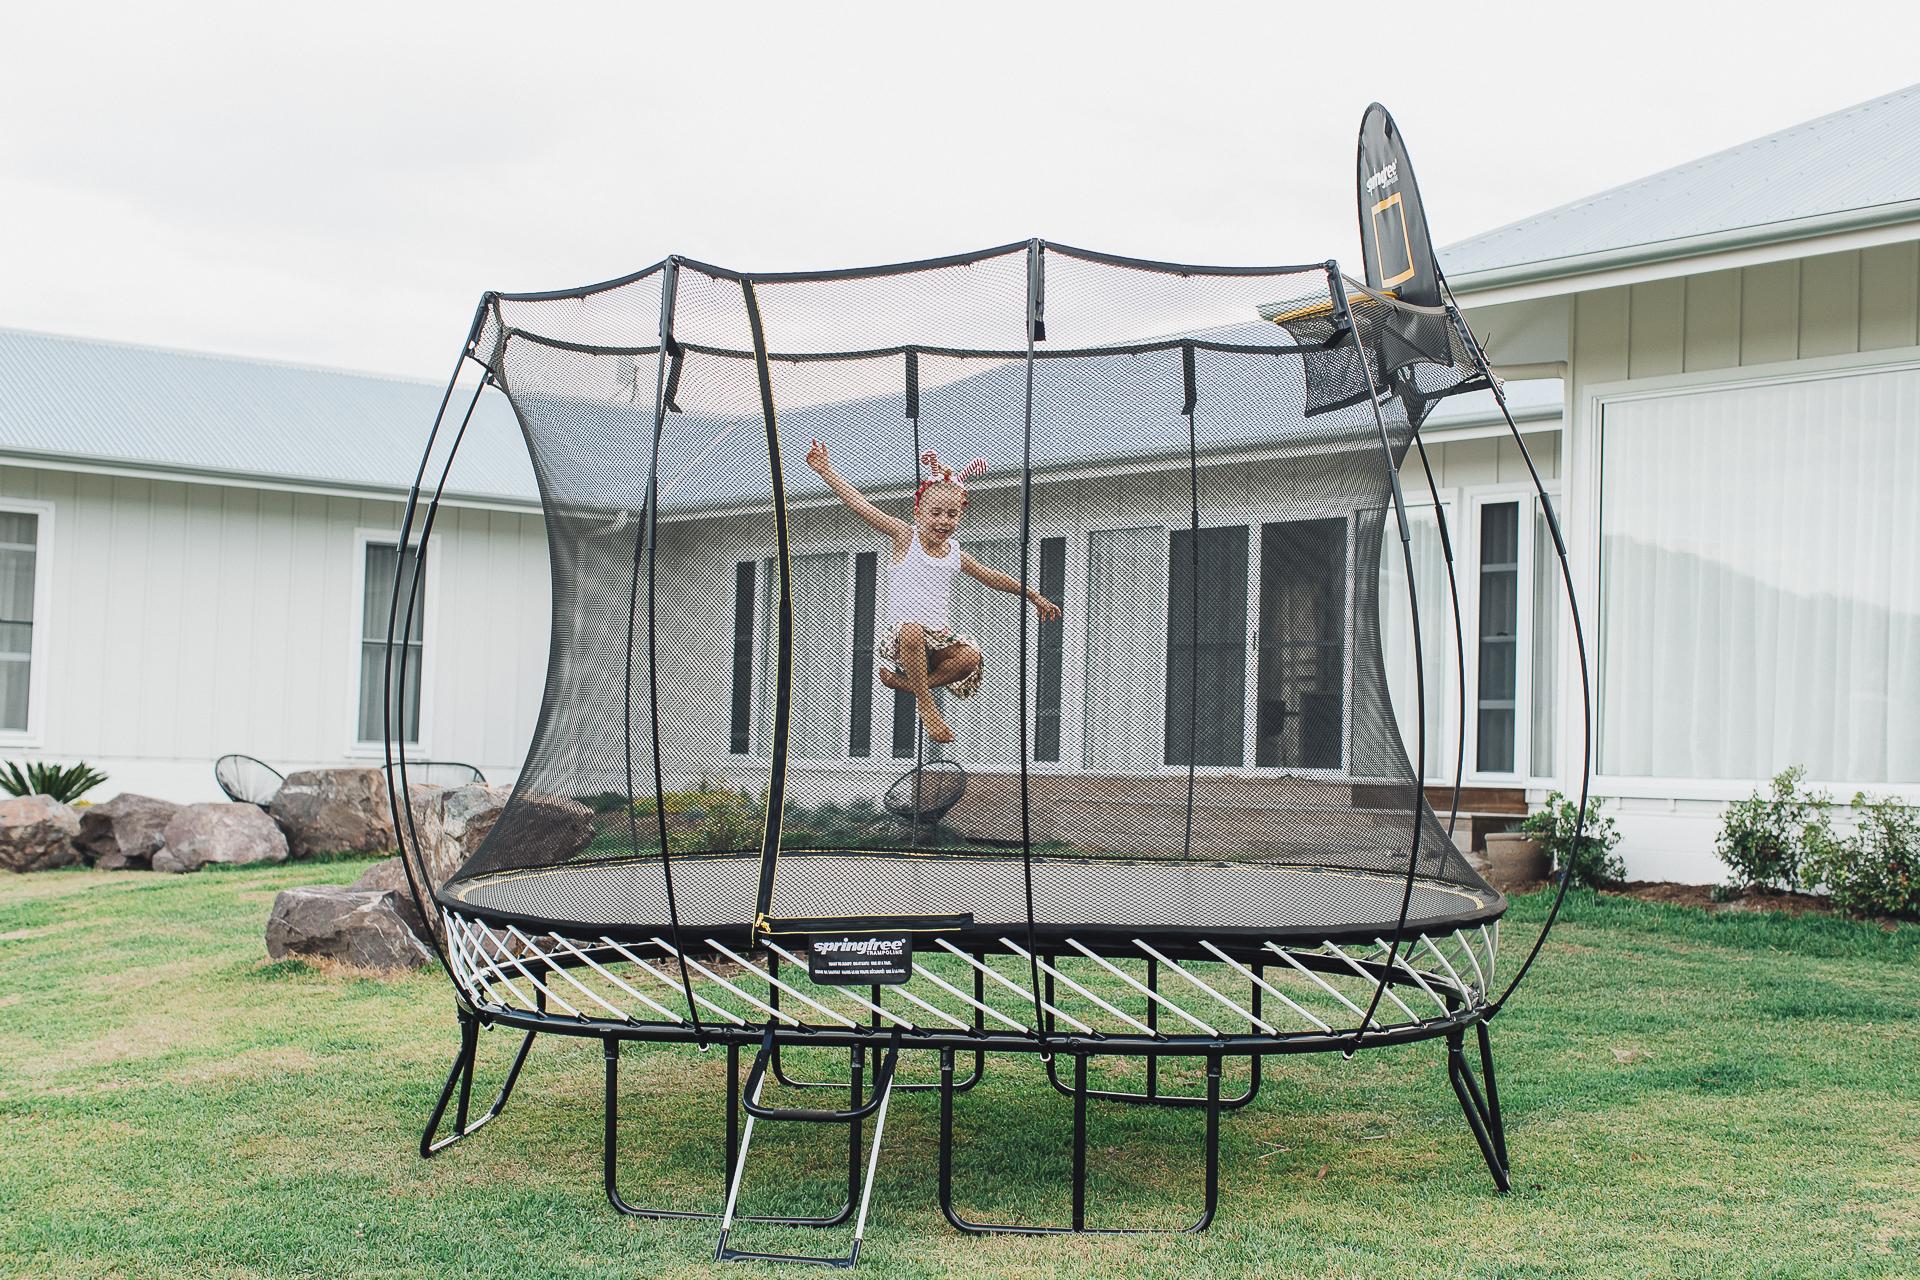 Child jumps on trampoline